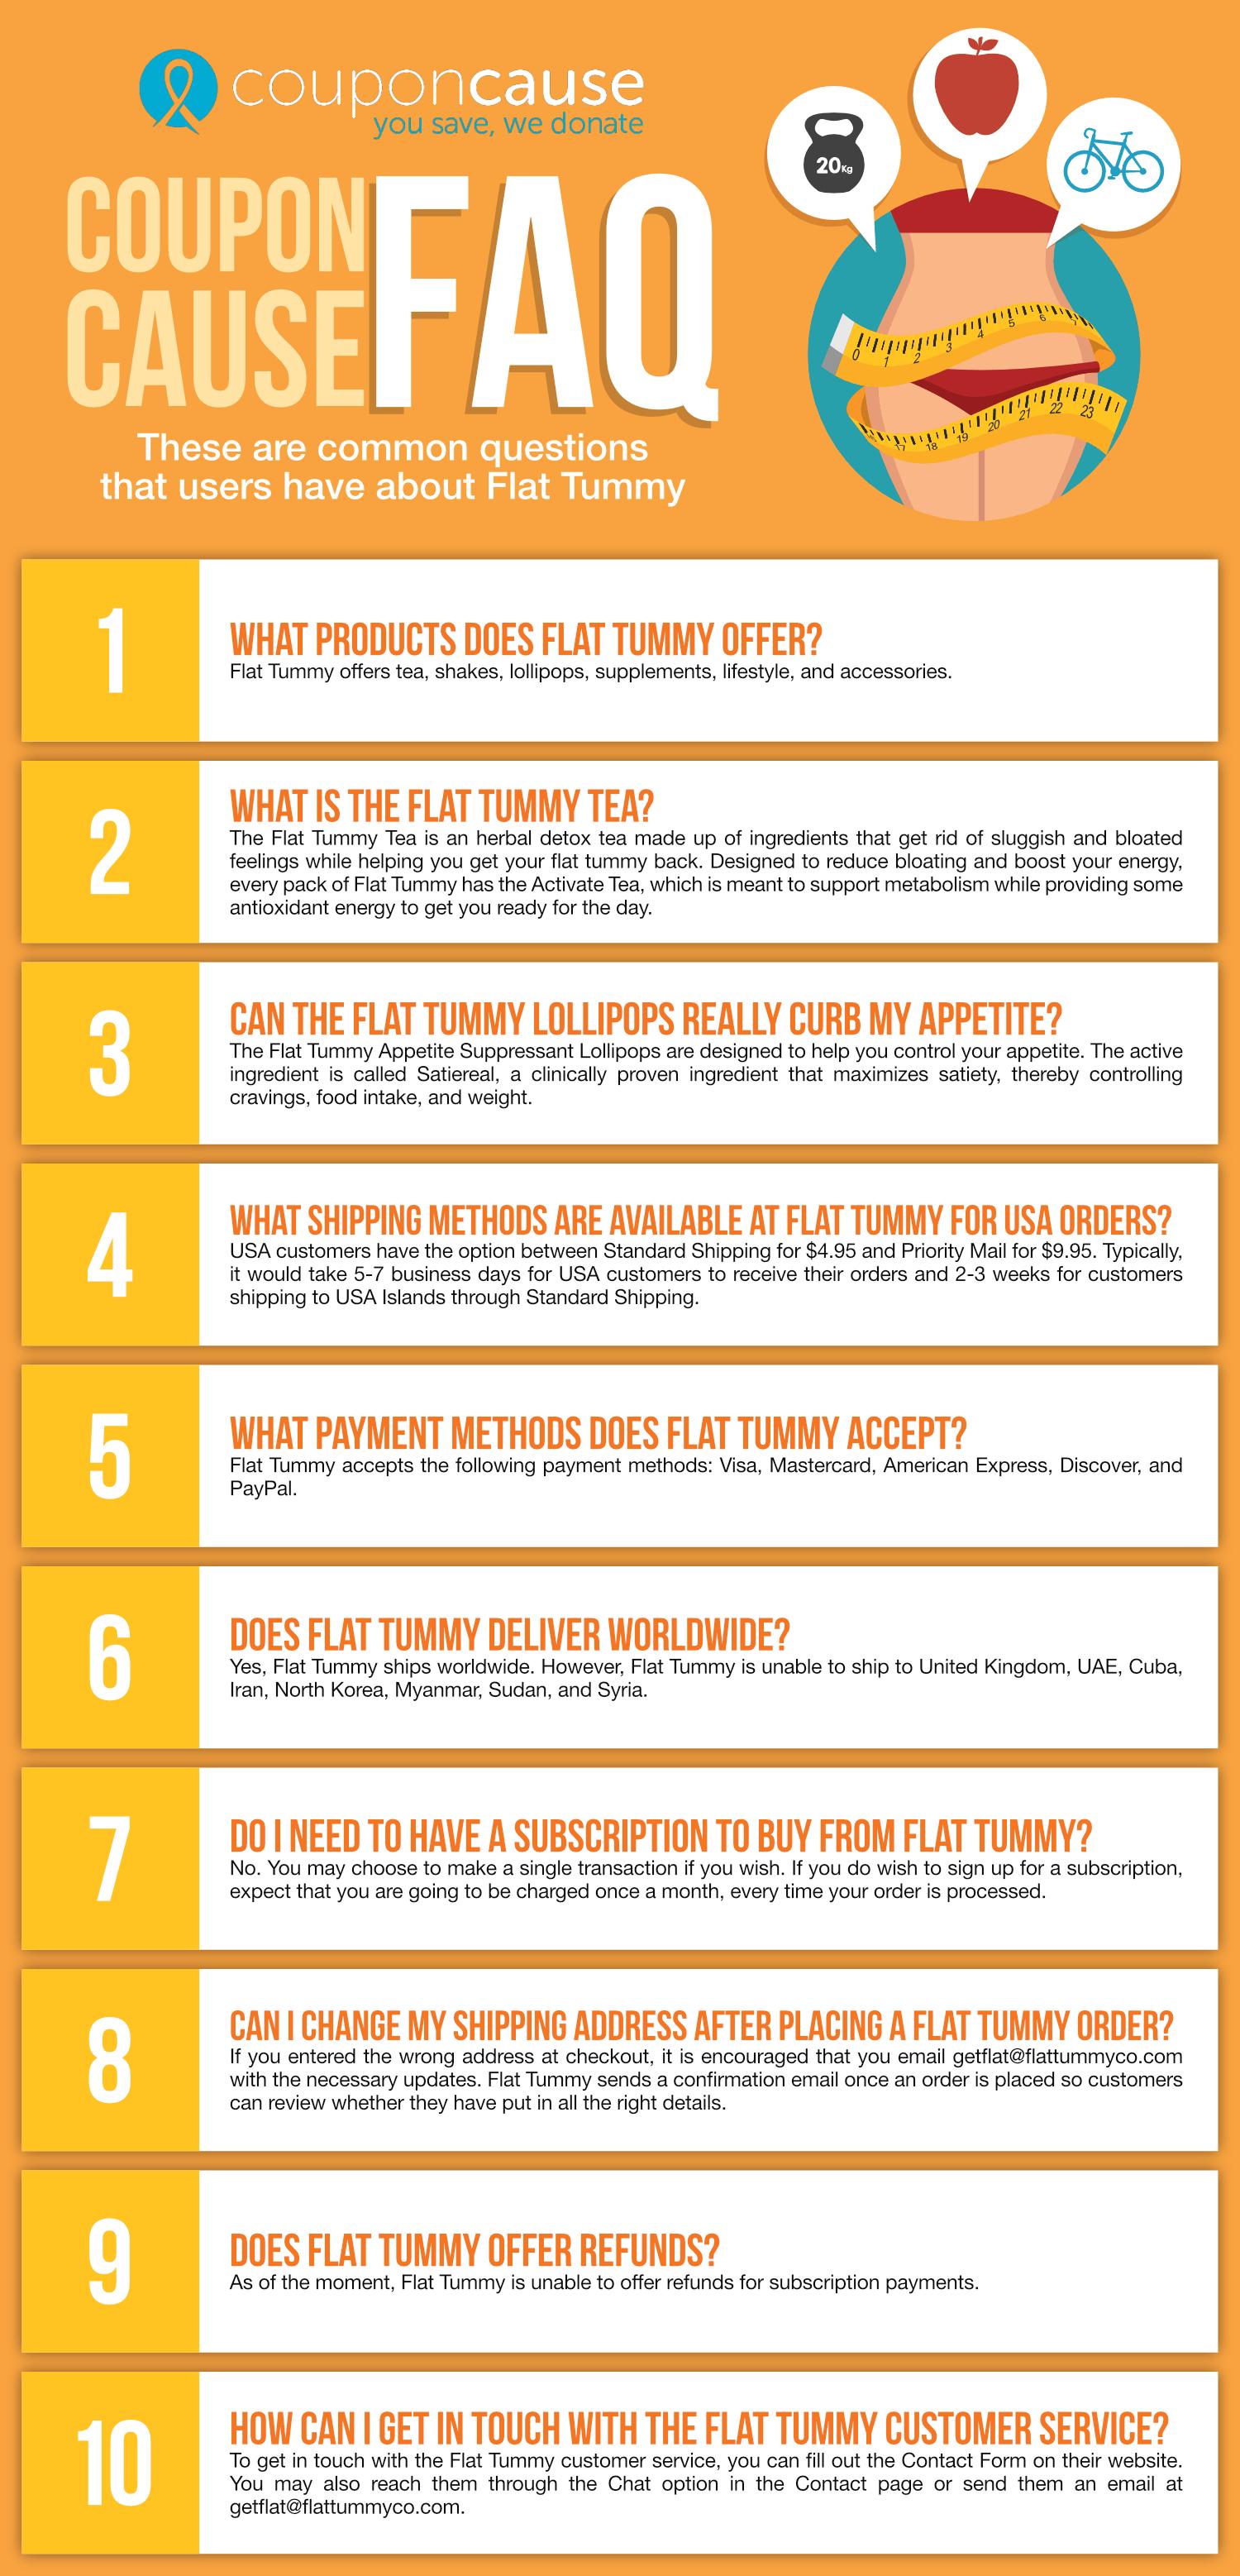 Flat Tummy Coupon Cause FAQ (C.C. FAQ)